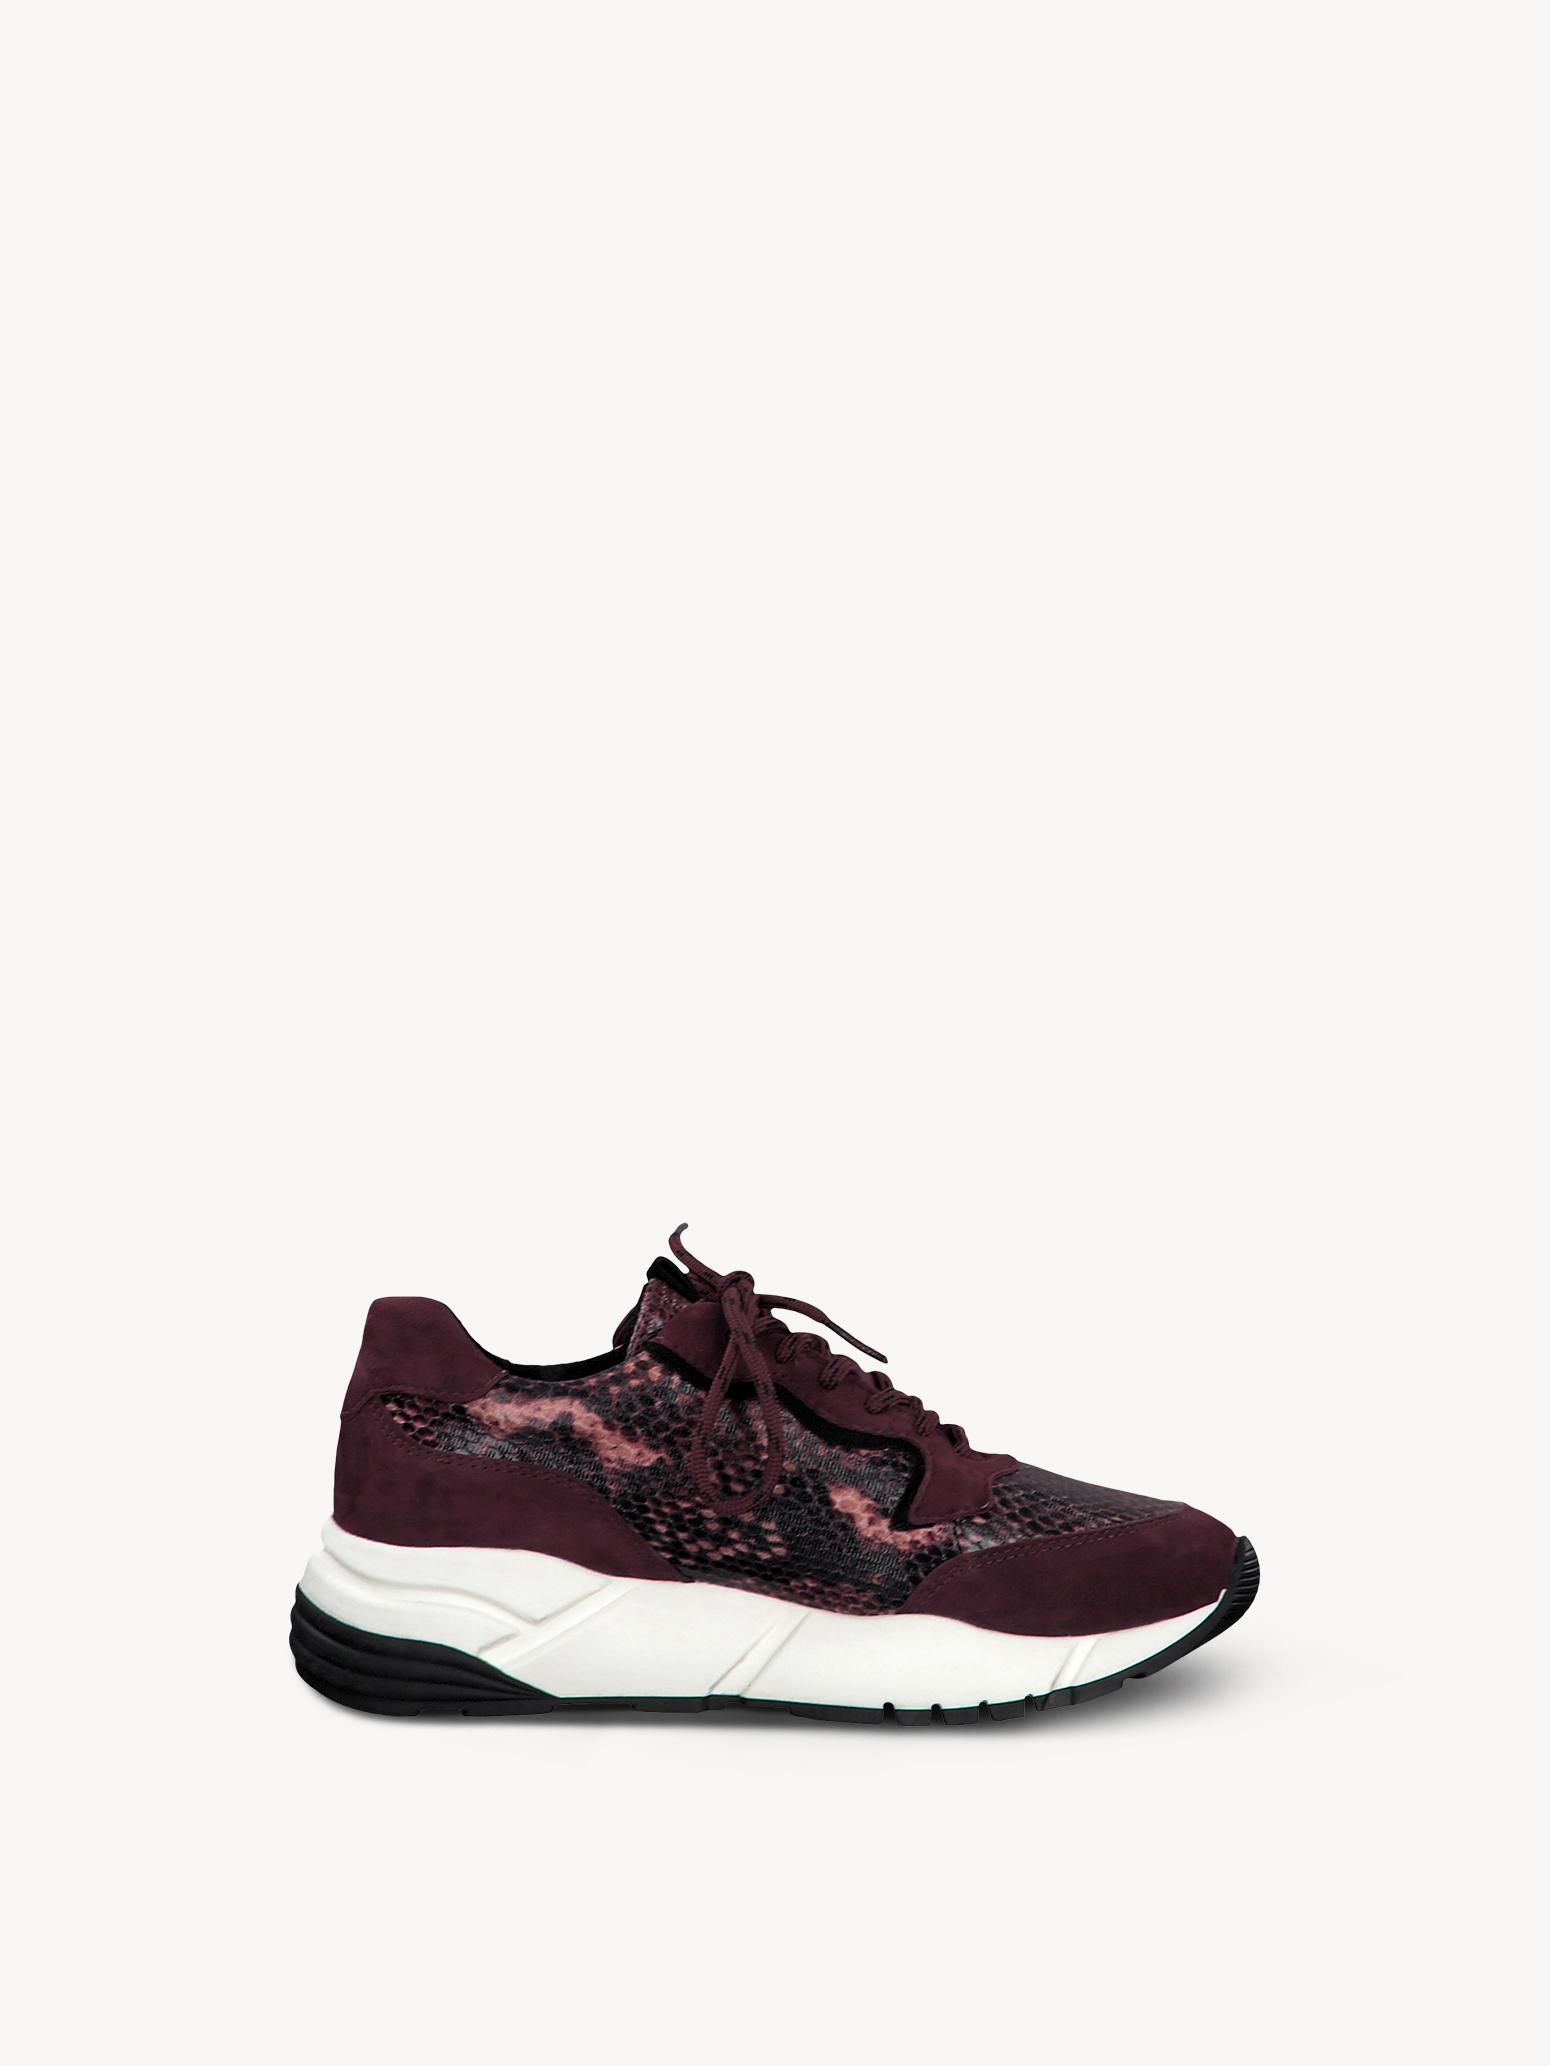 Tamaris Sneaker Damen » portofrei online kaufen  